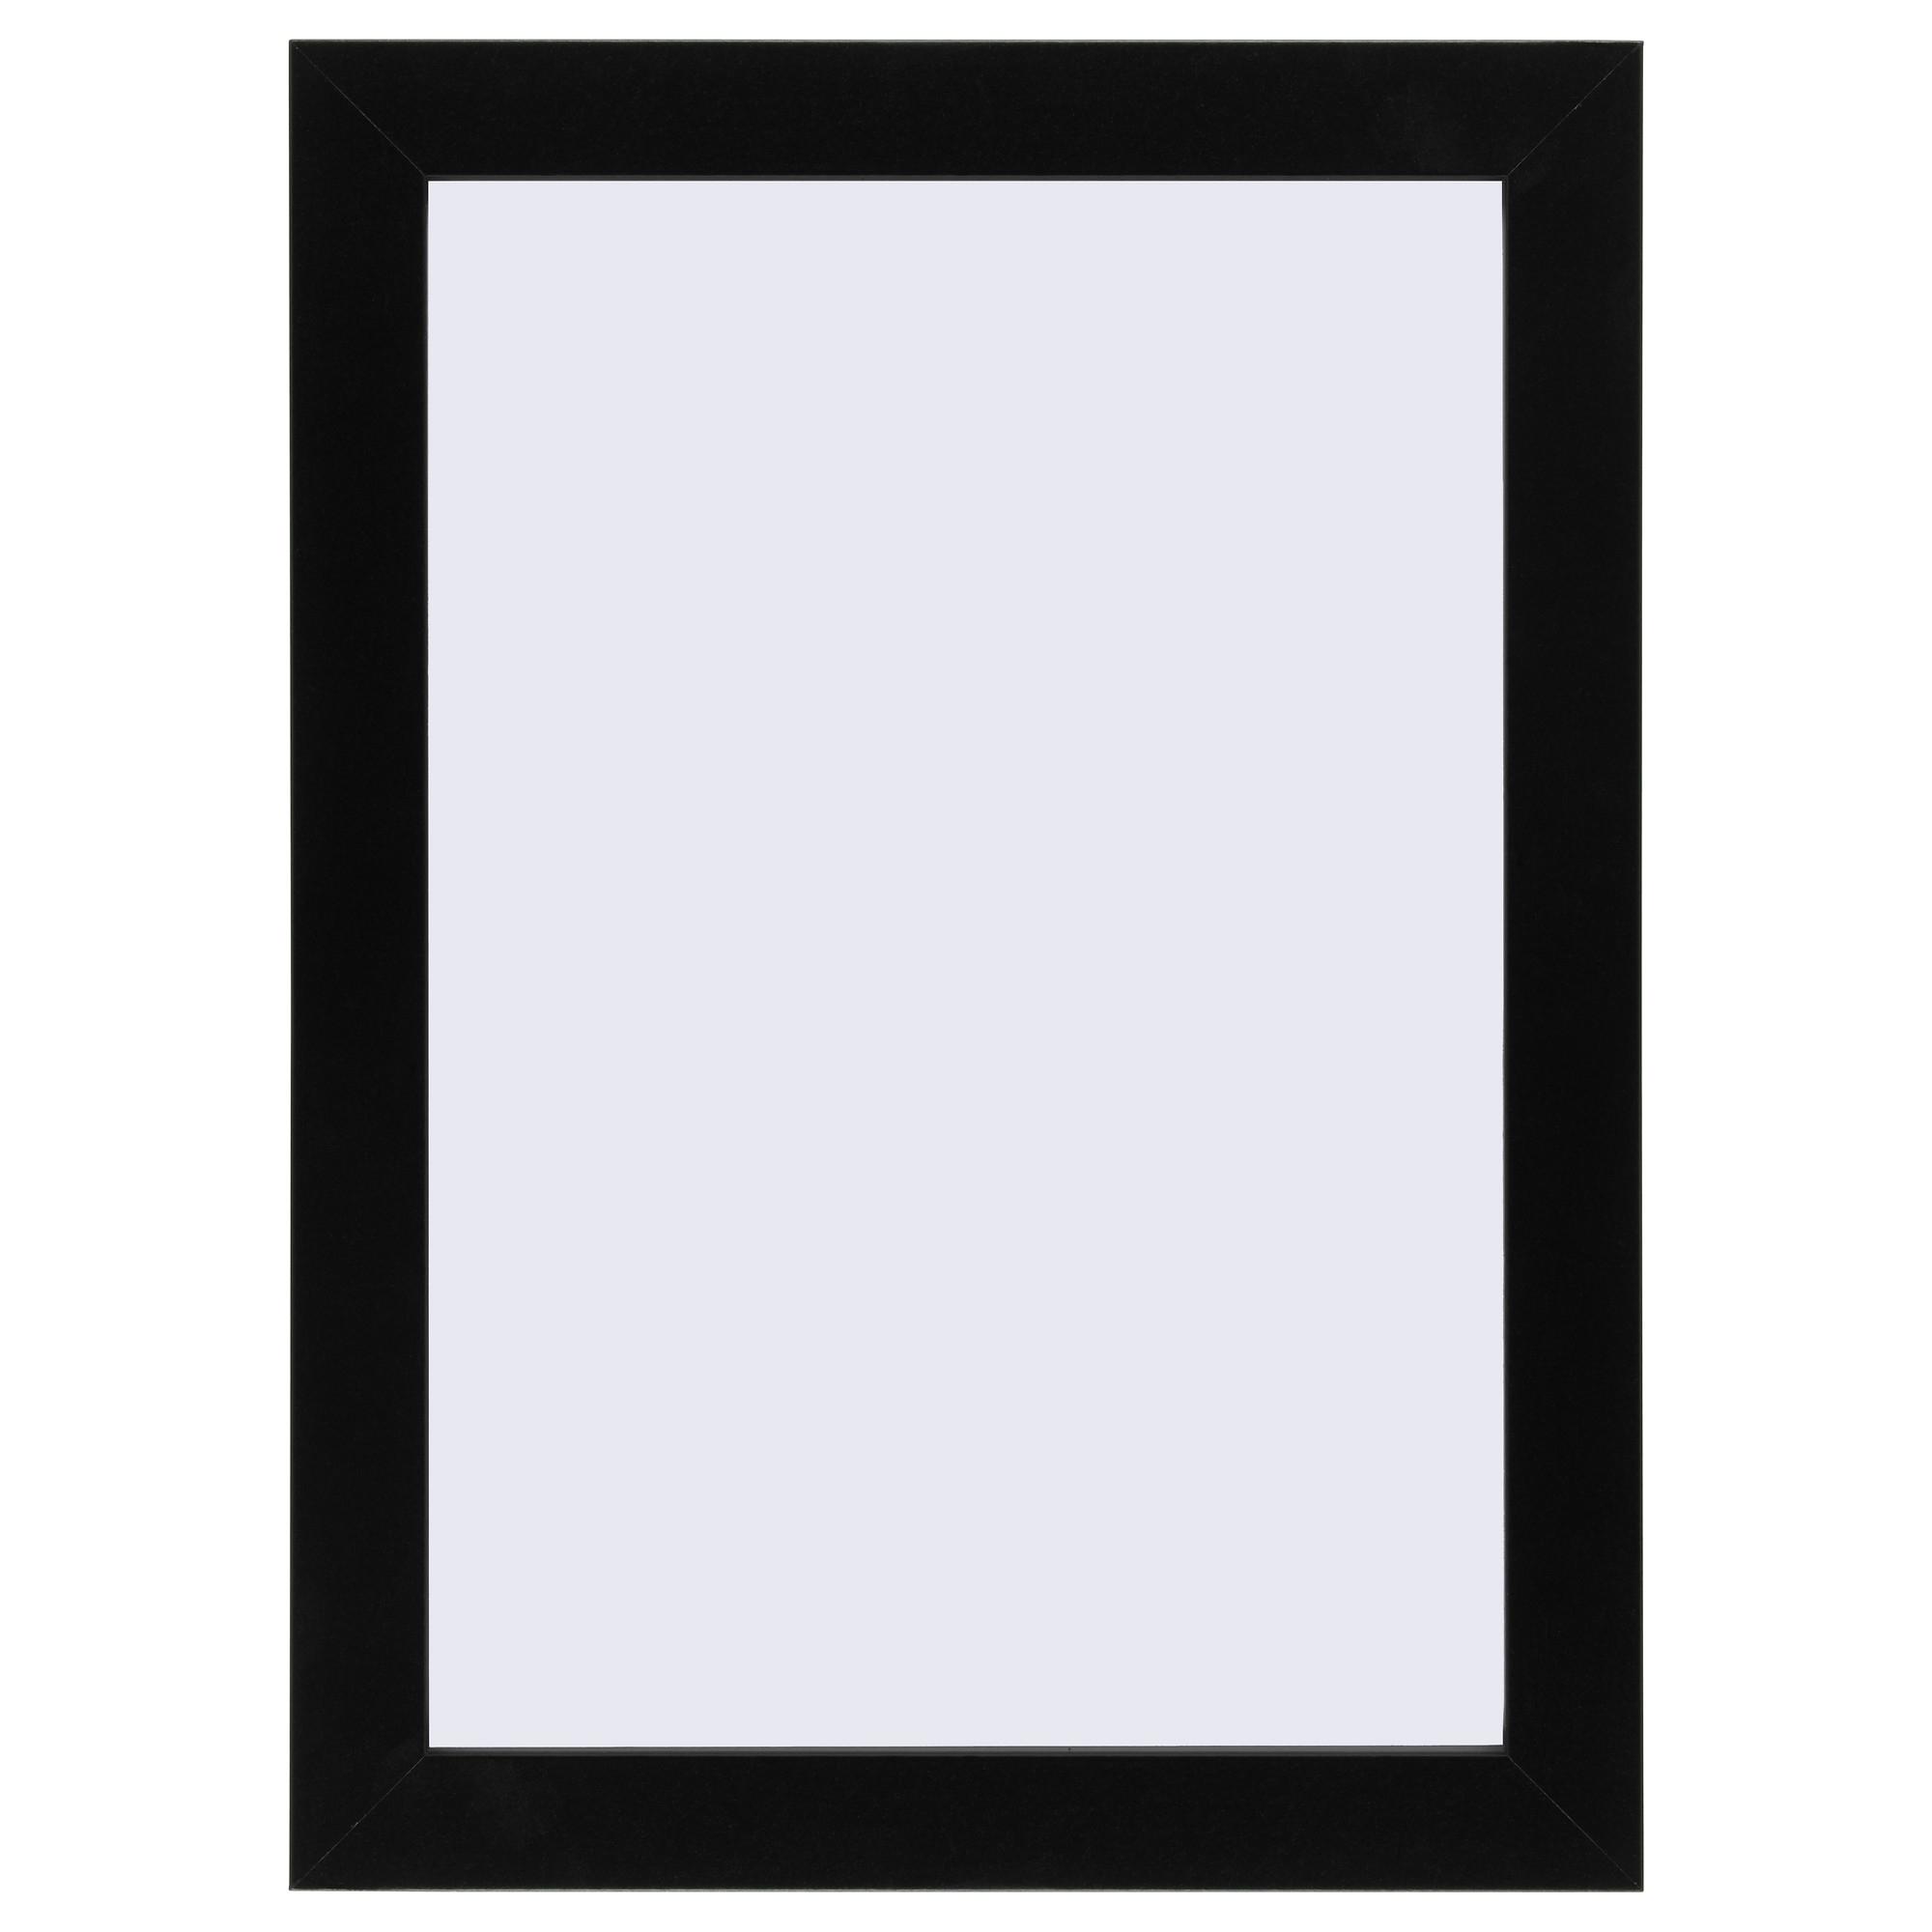 marcos para cartas tribales imagui. Black Bedroom Furniture Sets. Home Design Ideas